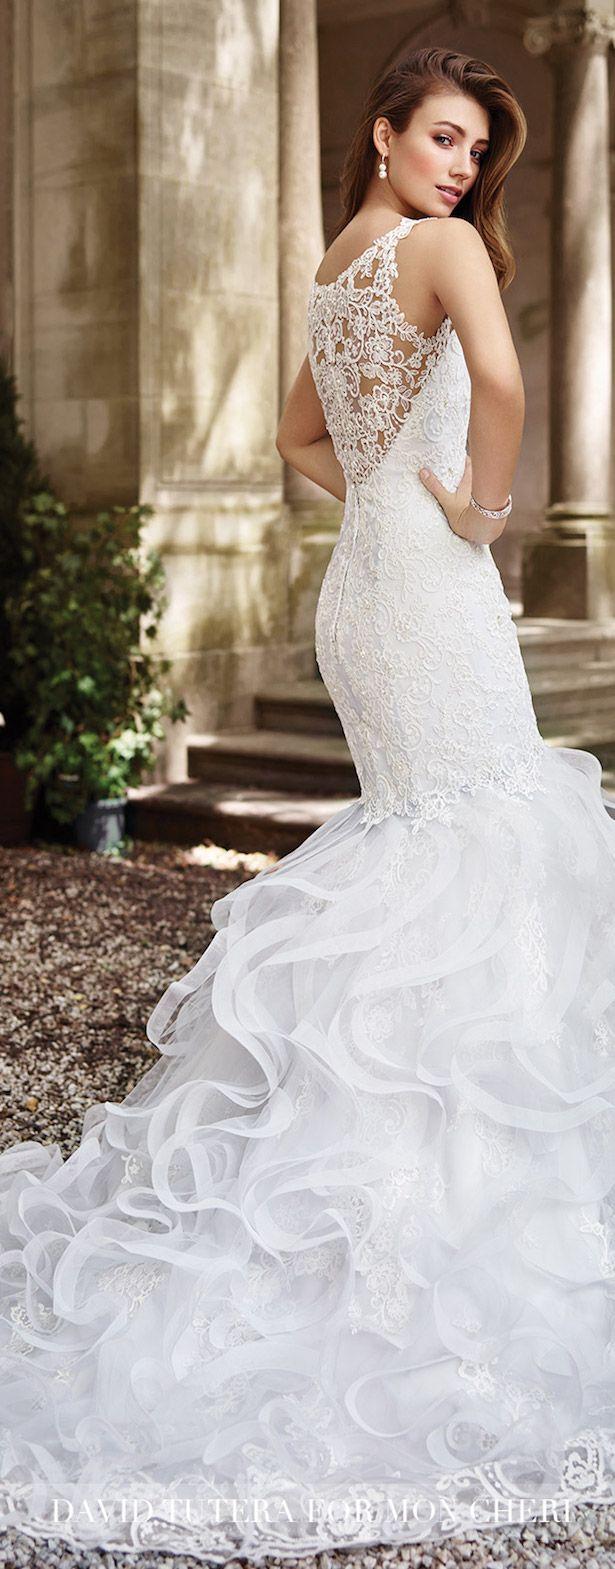 David Tutera Wedding Dress 2017